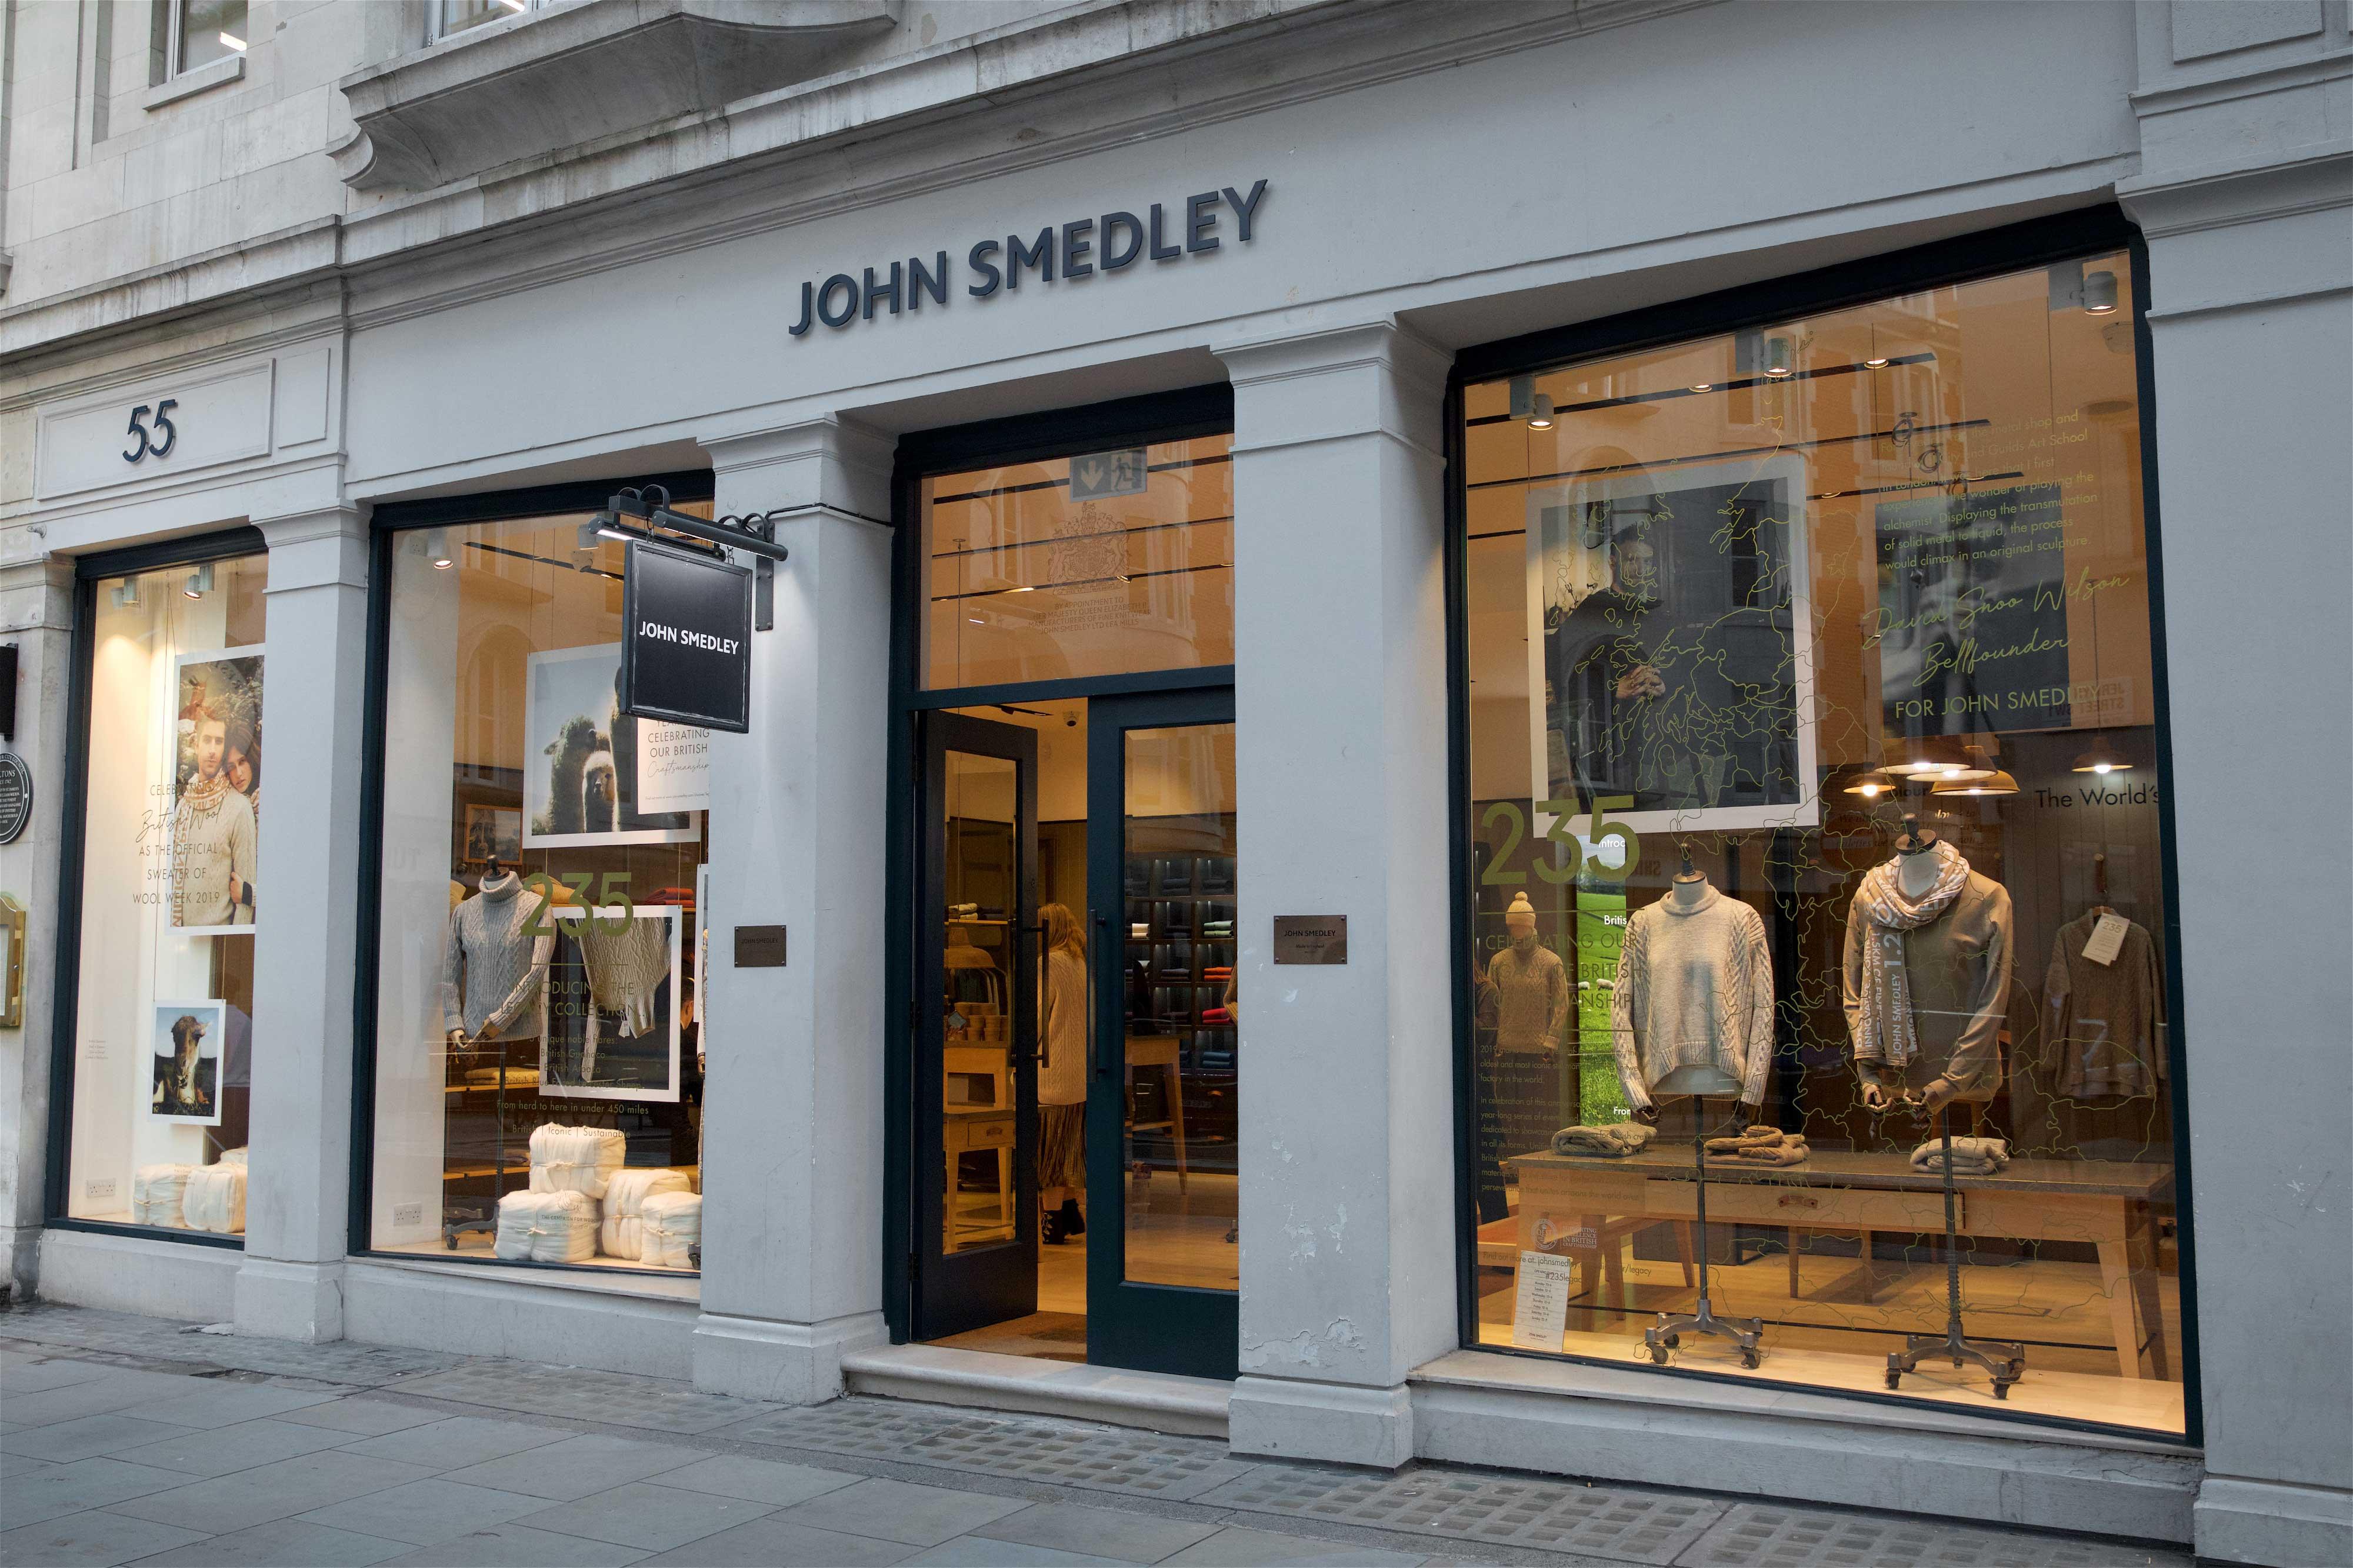 John Smedley shop front